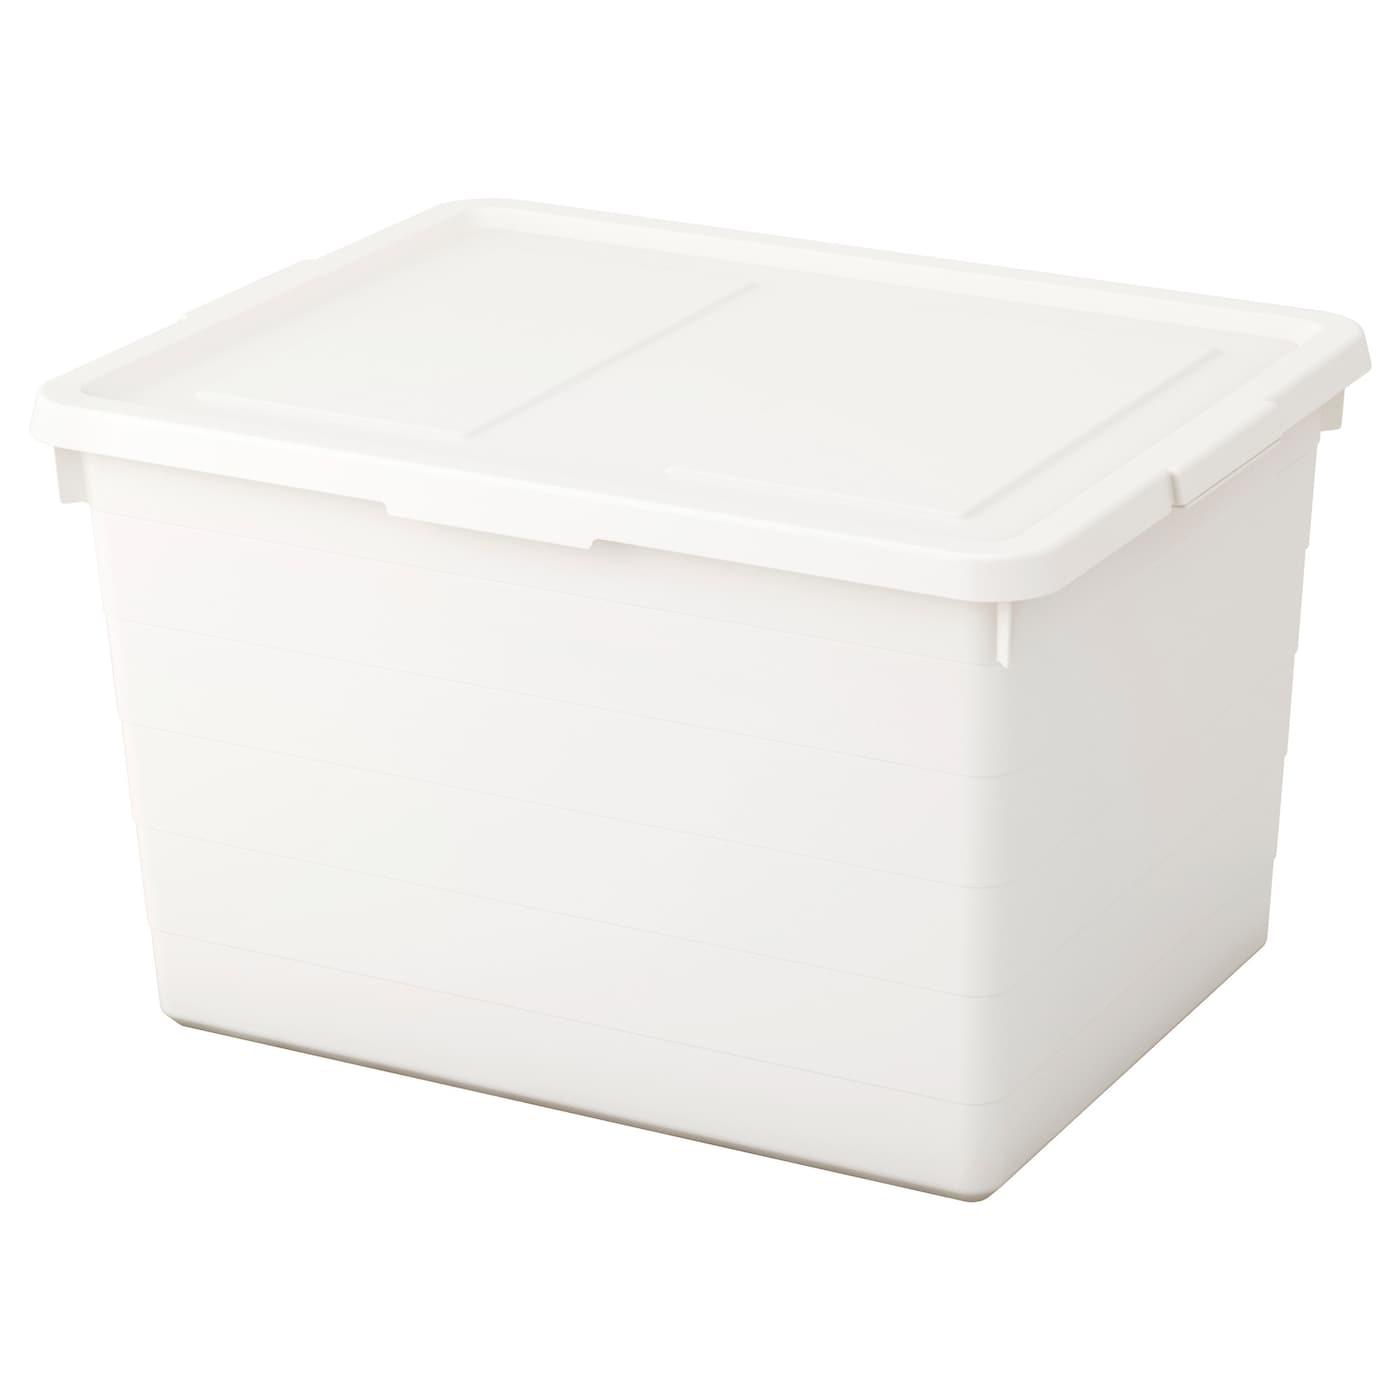 sockerbit box with lid white 38 x 51 x 30 cm ikea. Black Bedroom Furniture Sets. Home Design Ideas